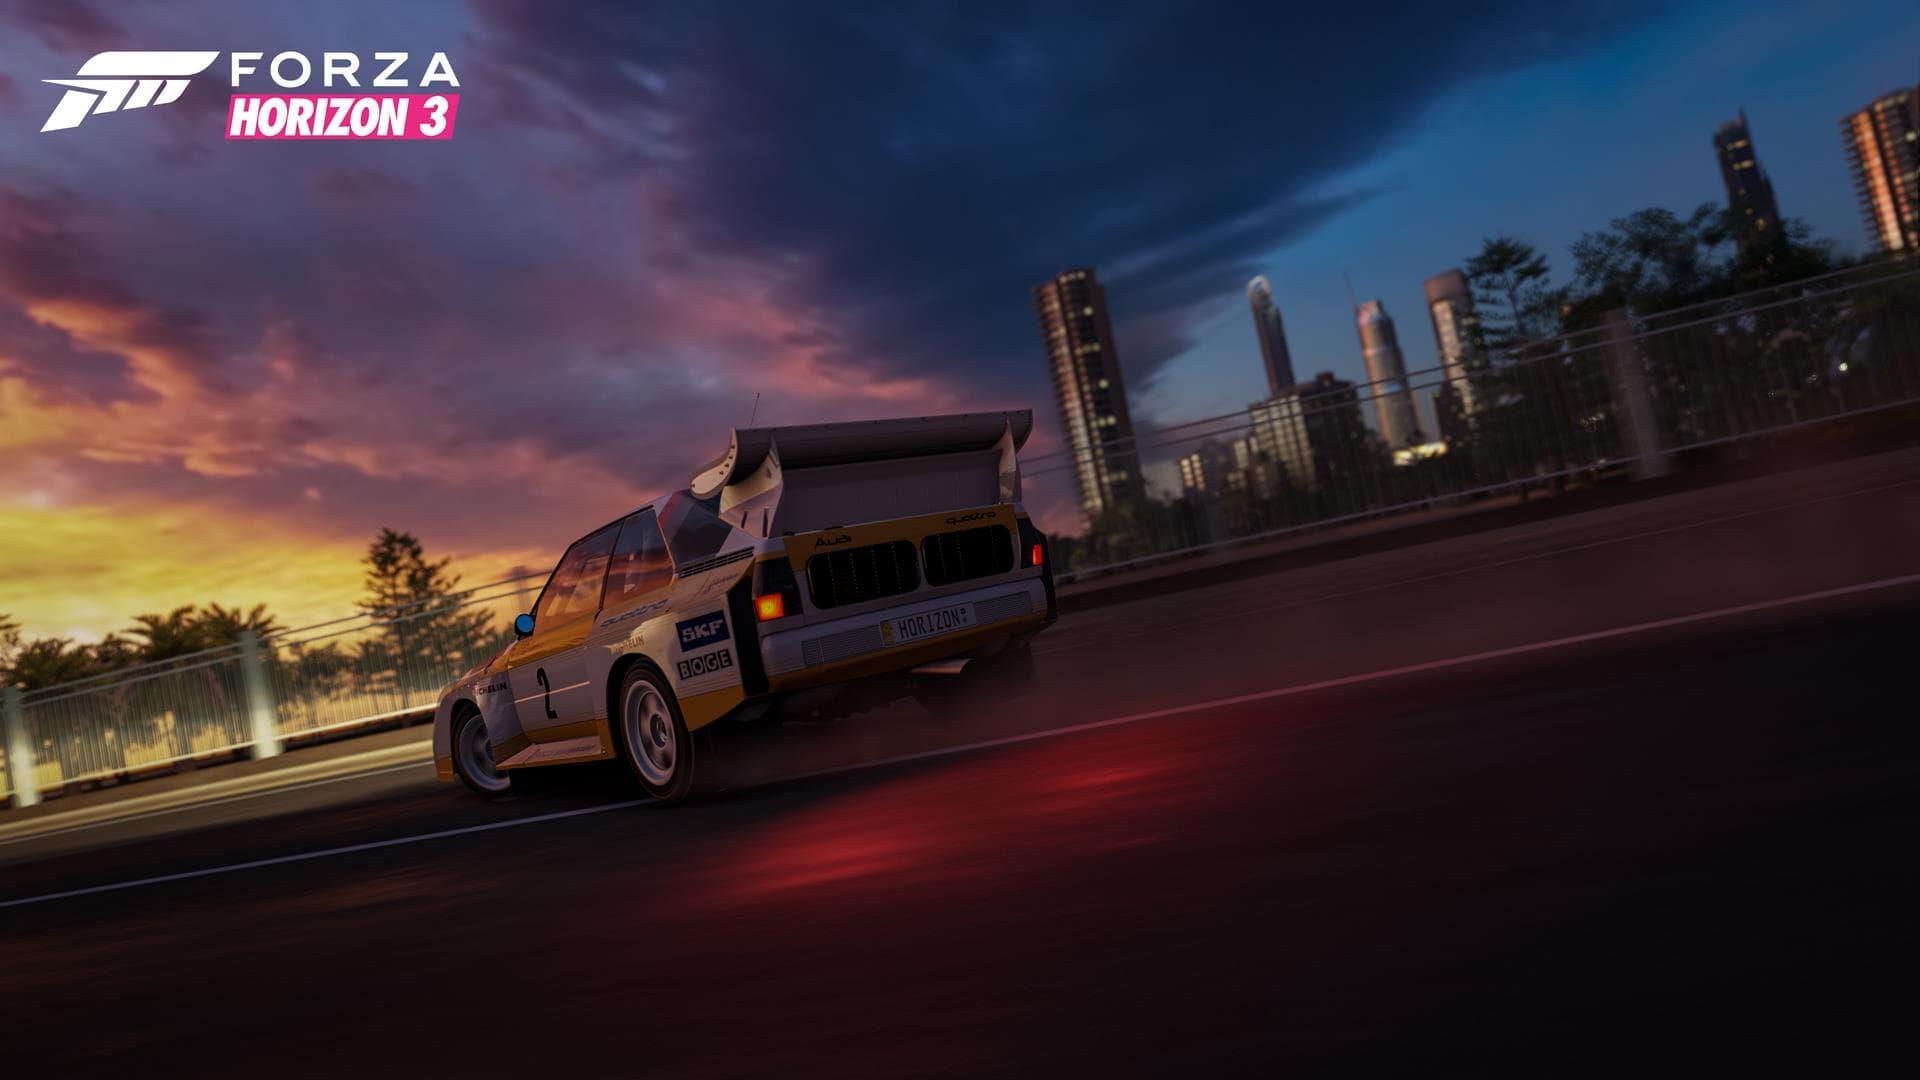 Forza Horizon 3 Desktop wallpaper